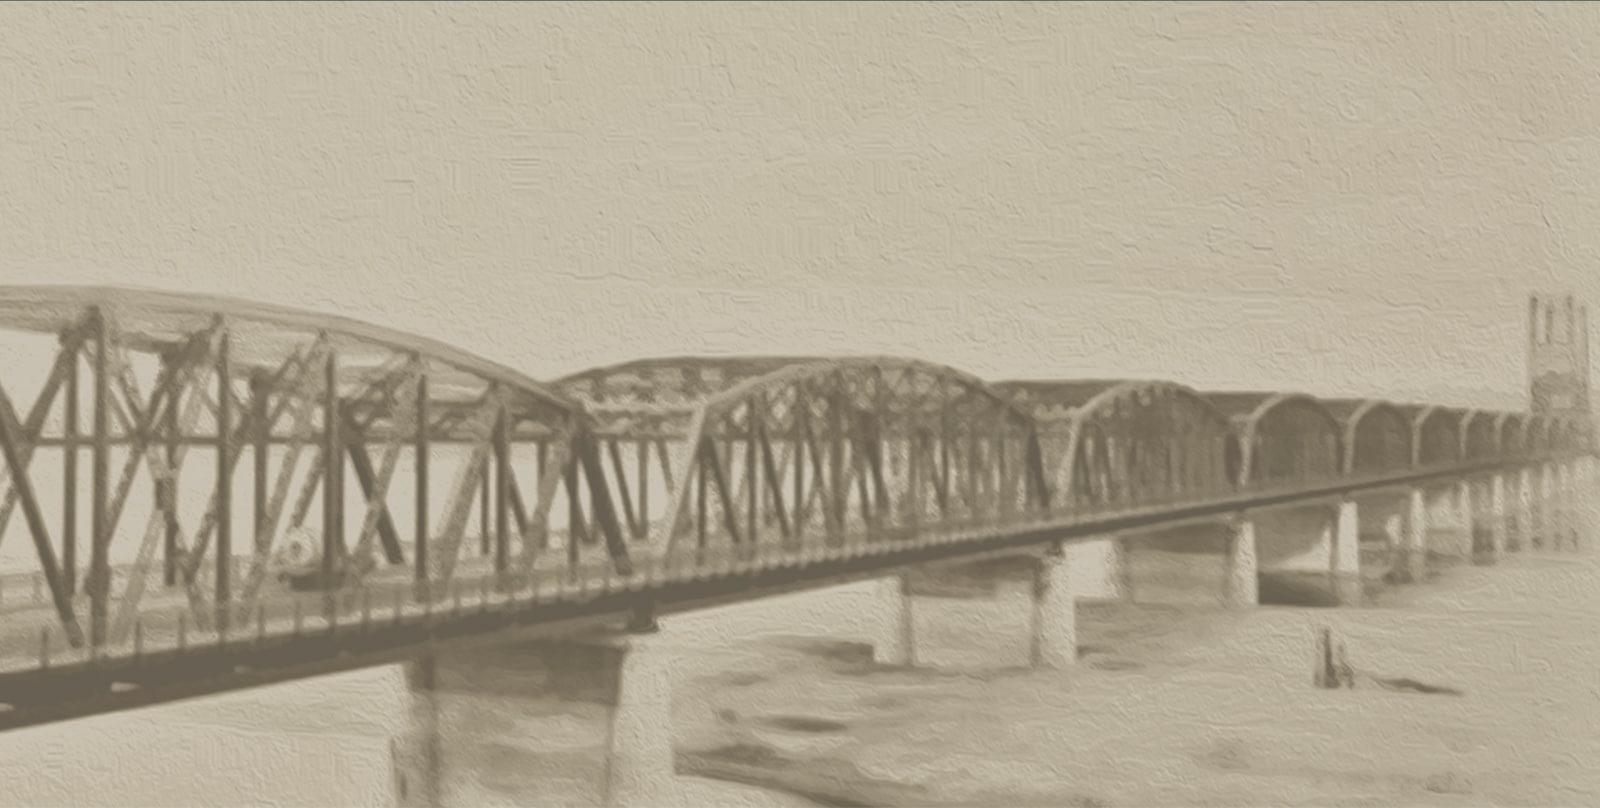 historical image of vancouver bridge